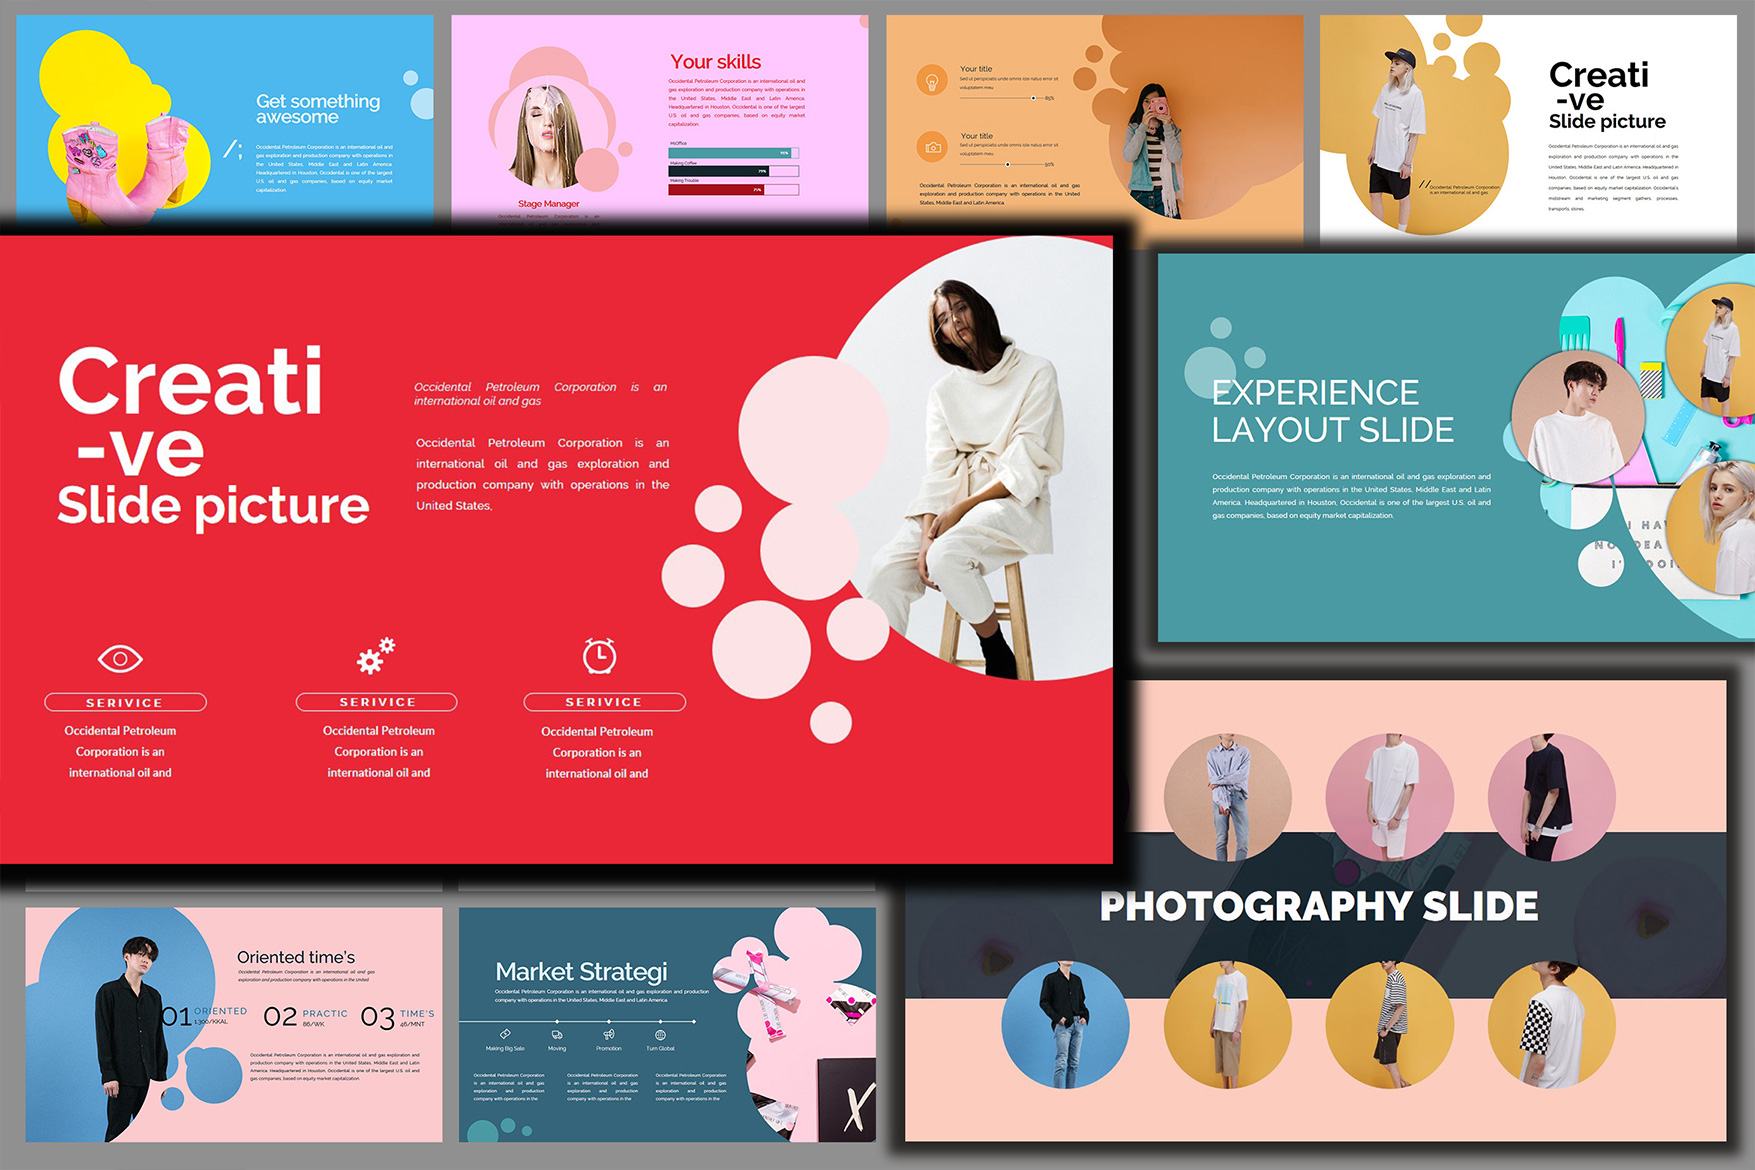 Velvety Fashion Google Slides Presentation example image 2